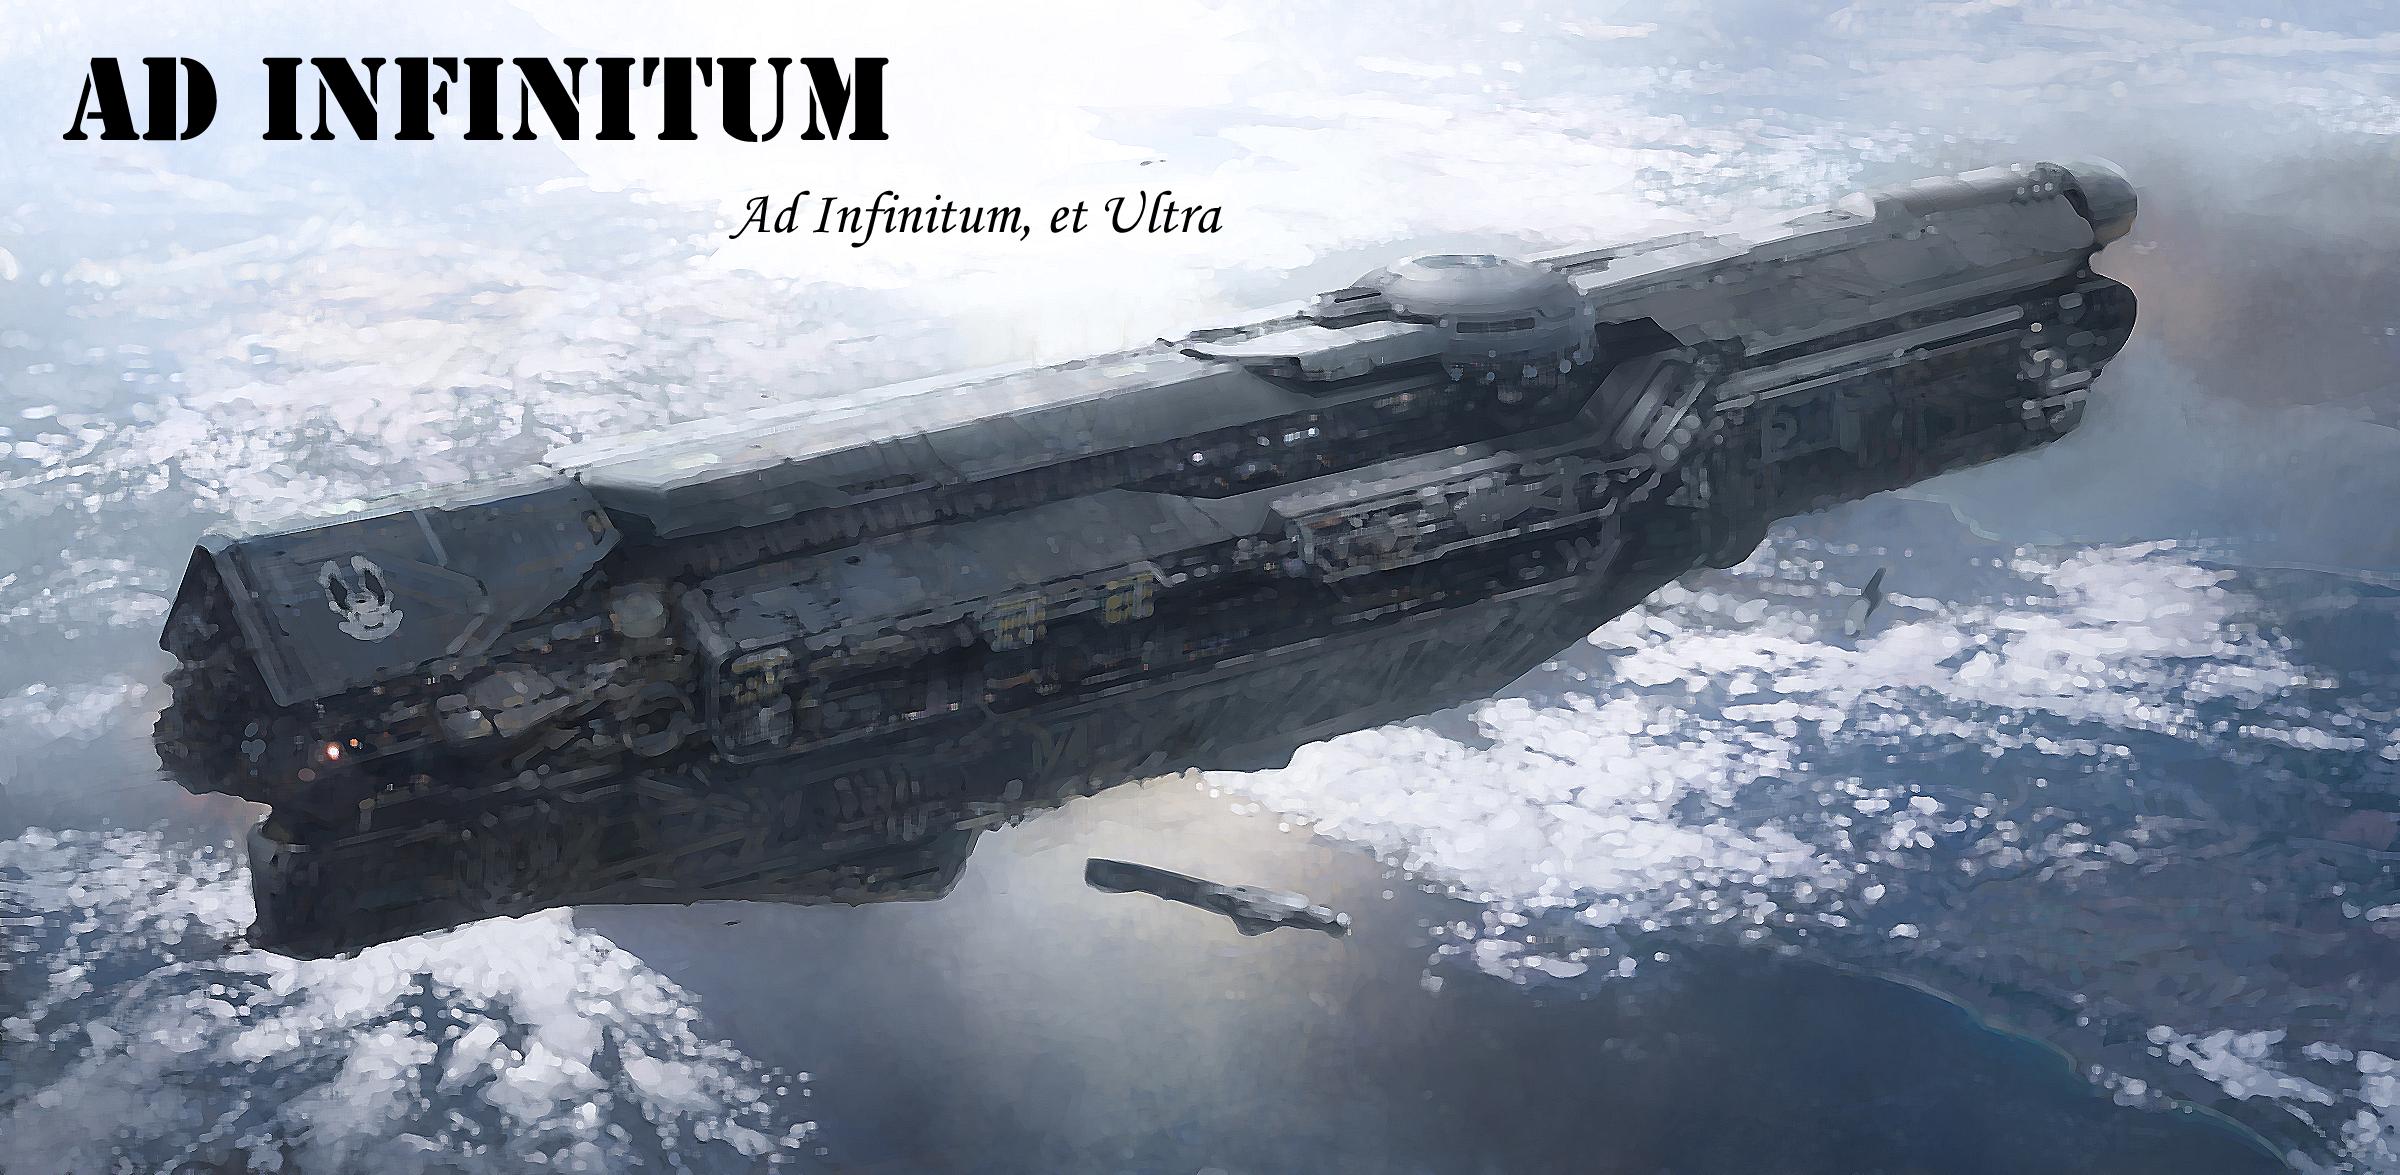 Halo: Ad Infinitum - Halo Fanon - The Halo Fan Fiction Wiki